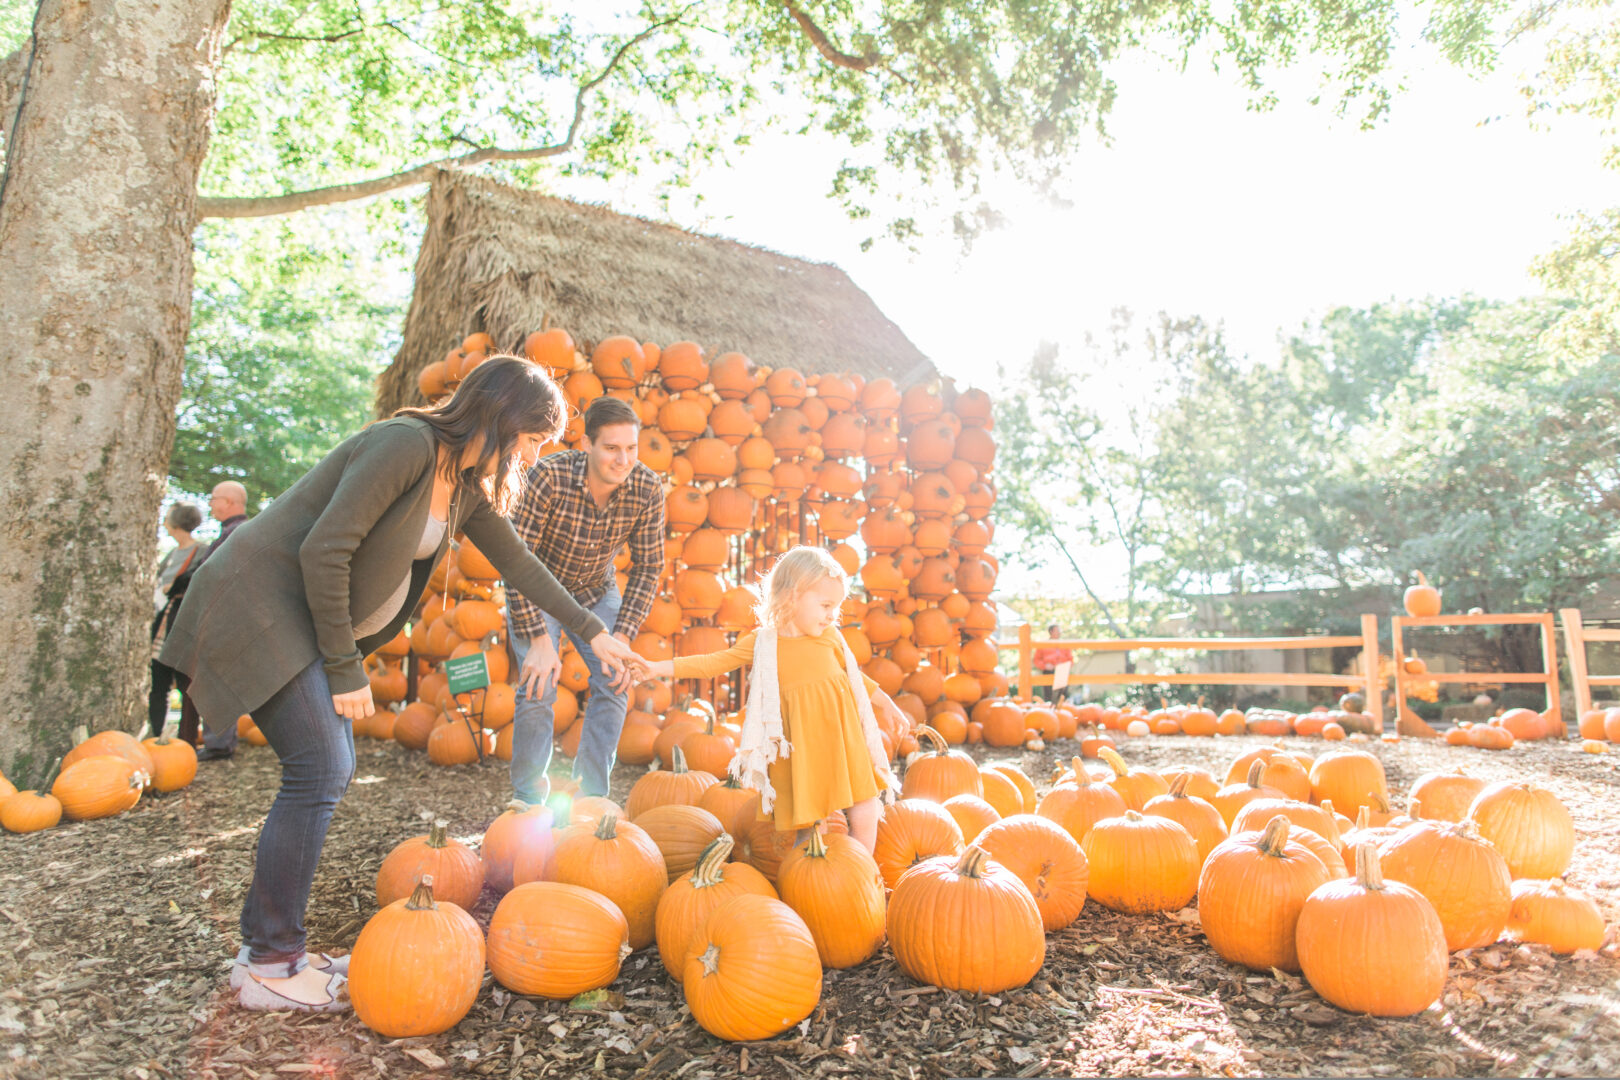 Family having fun at Cheekwood Harvest Annual Fall Festival in Nashville, TN.